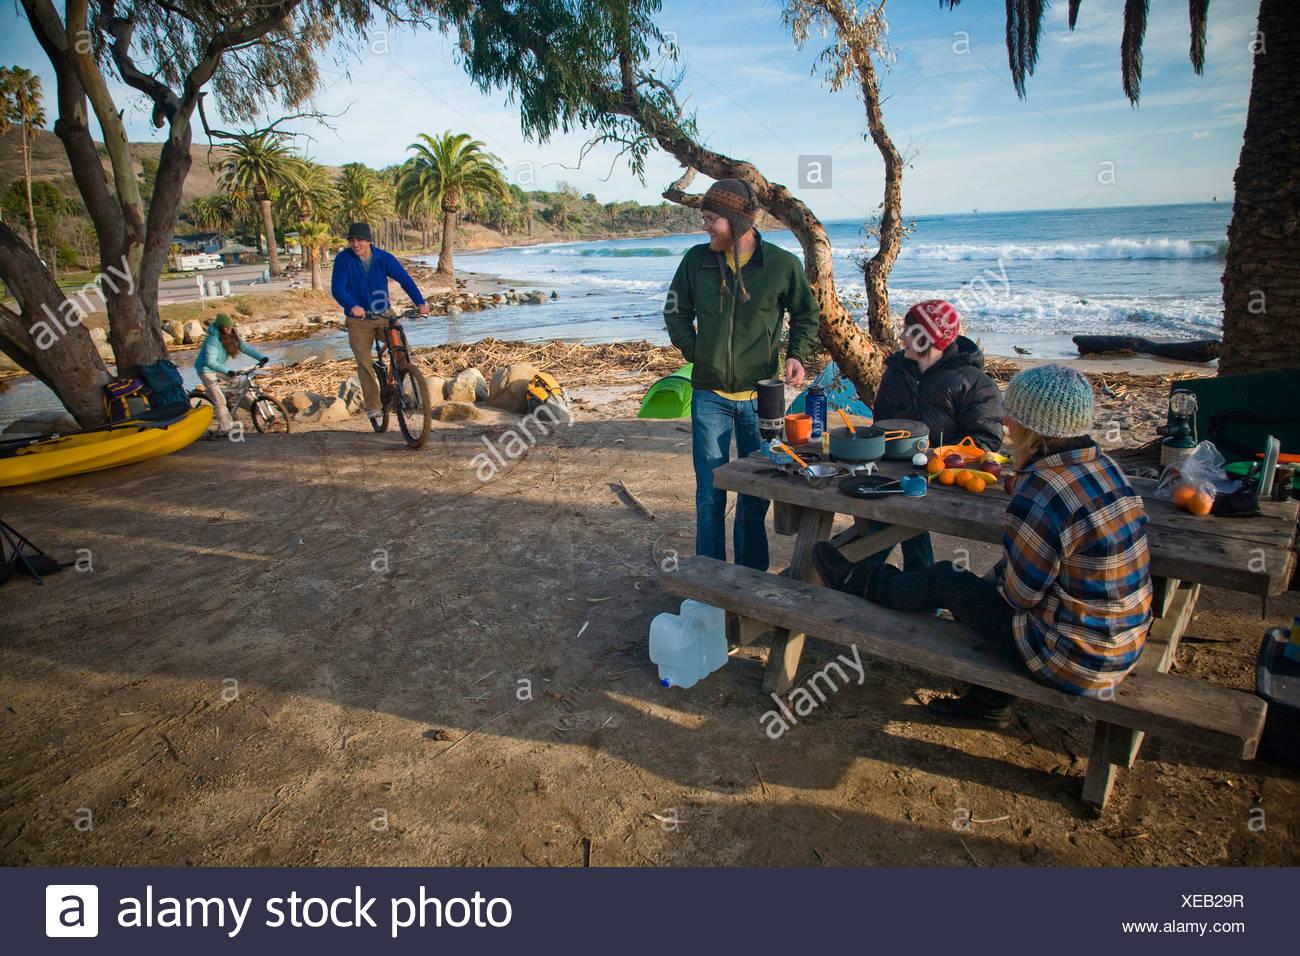 el capitan state beach stock photos & el capitan state beach stock